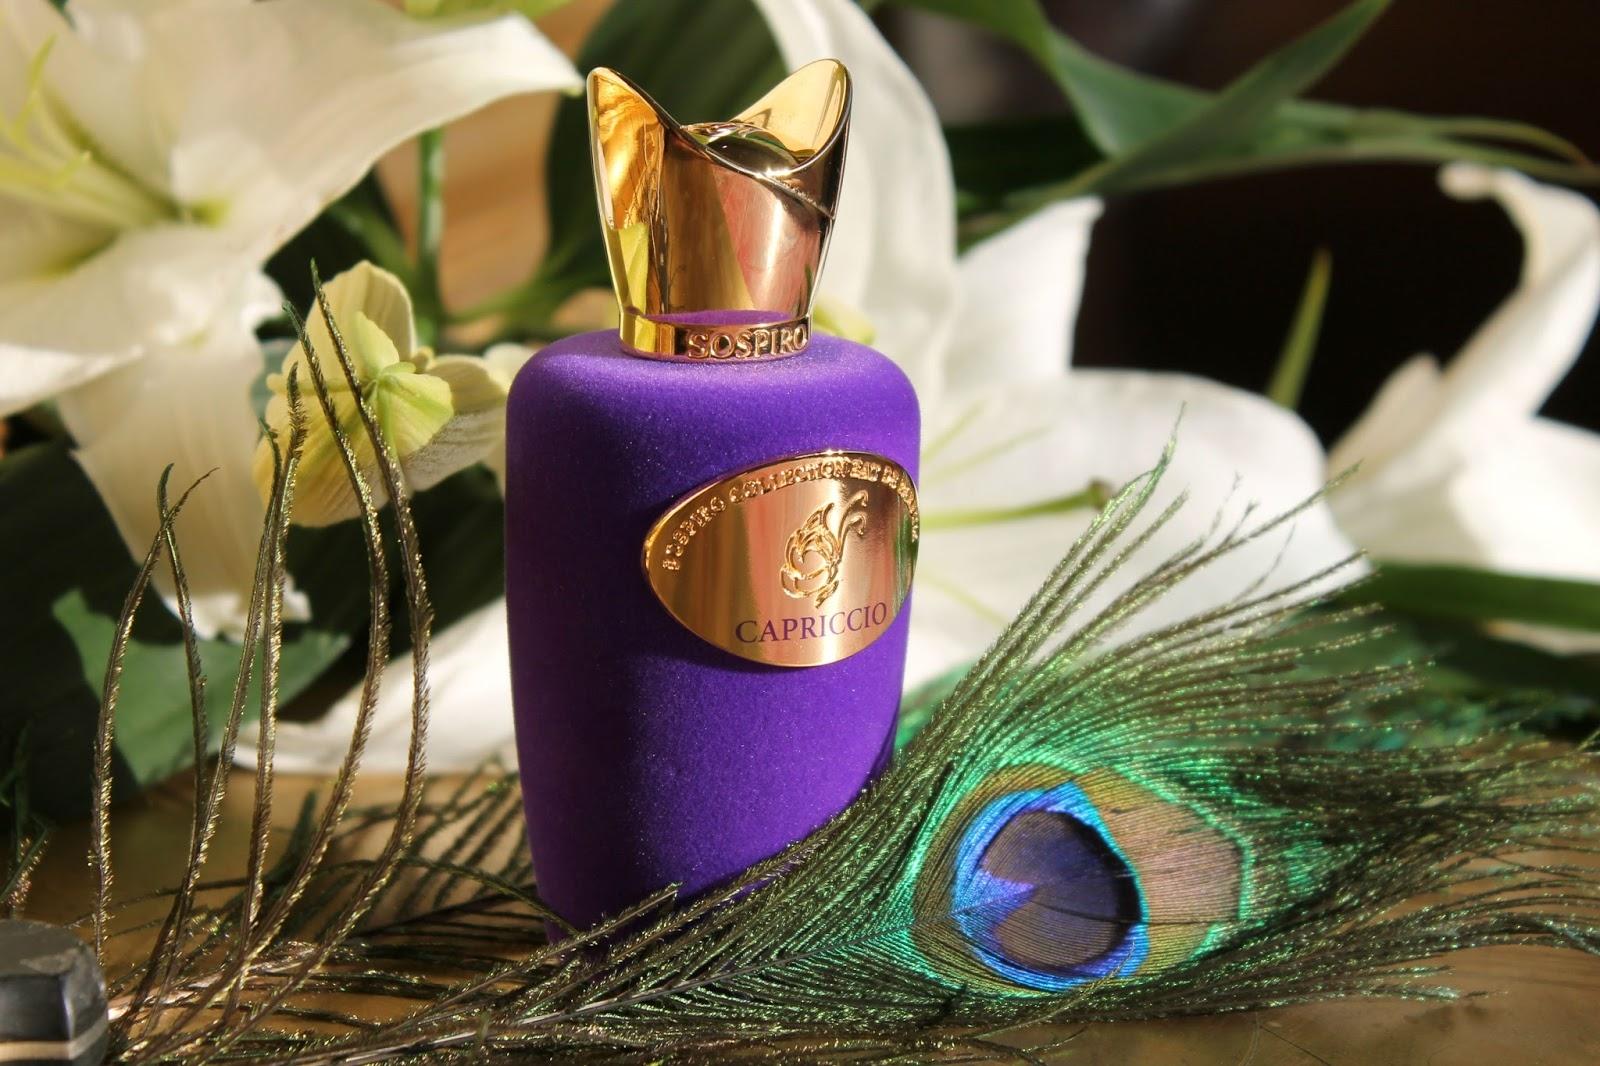 Sospiro Perfumes Capriccio